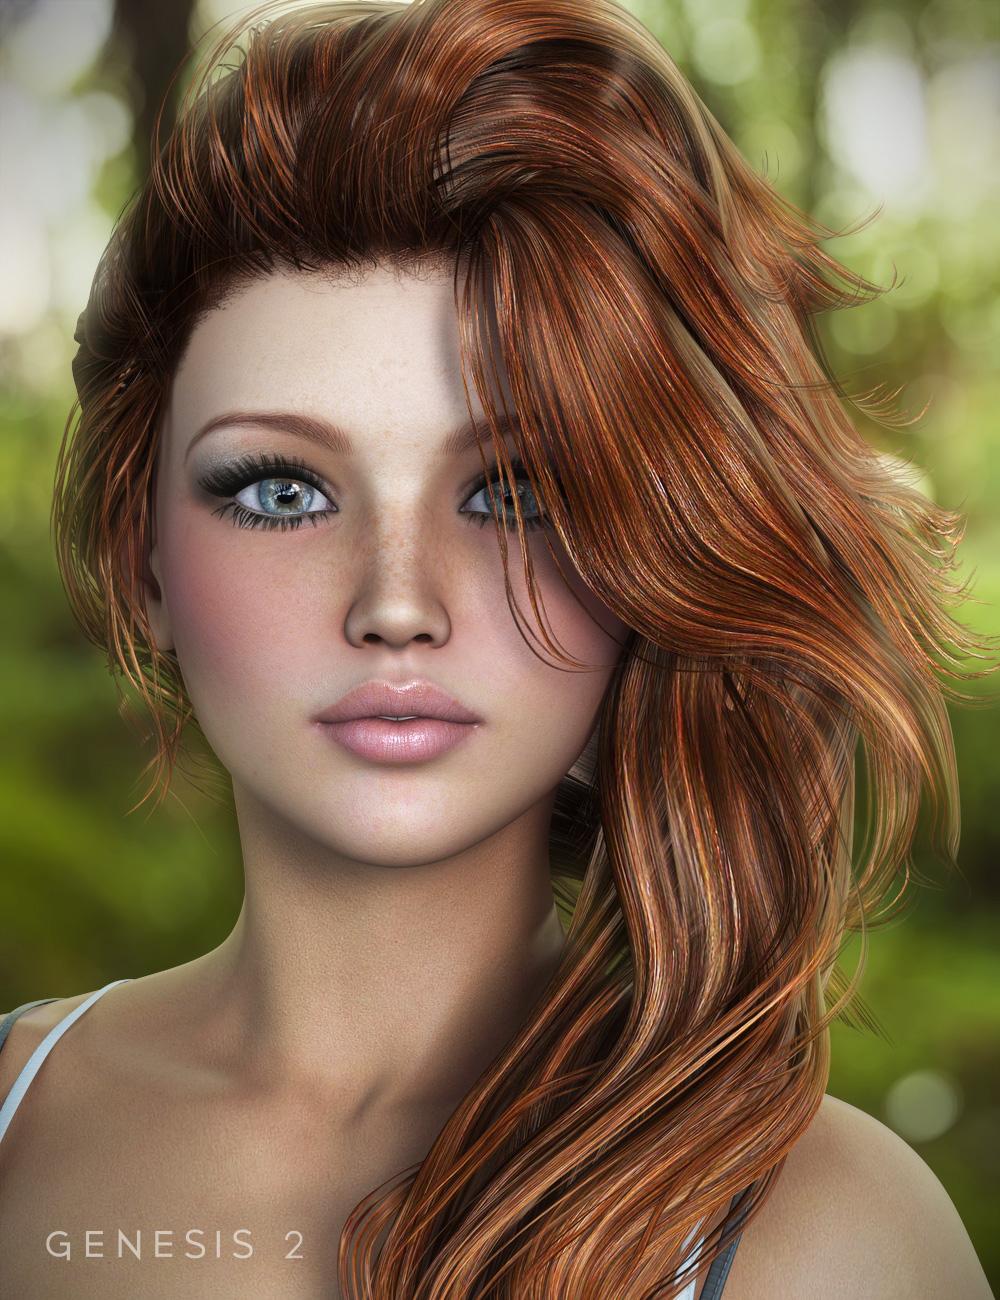 End of Summer Hair for Genesis and Genesis 2 Female(s) by: goldtassel, 3D Models by Daz 3D